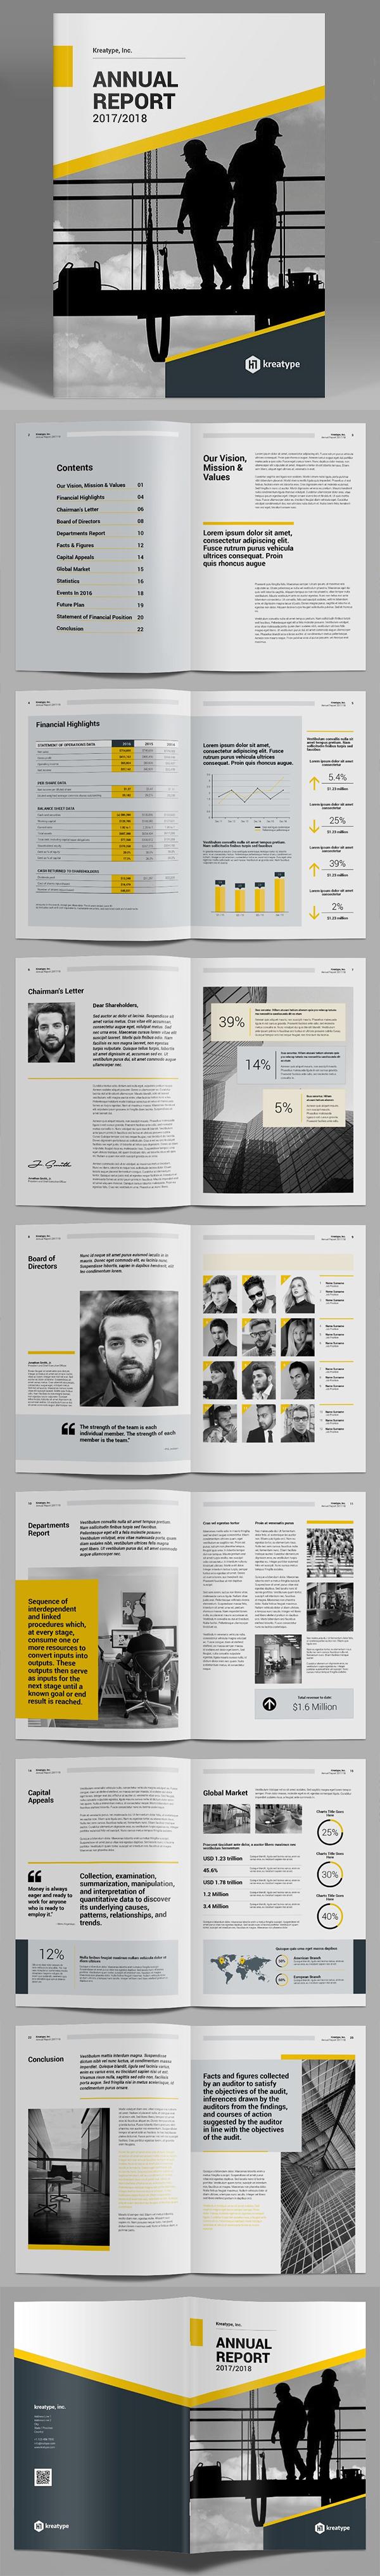 Kreatype Annual Report Template